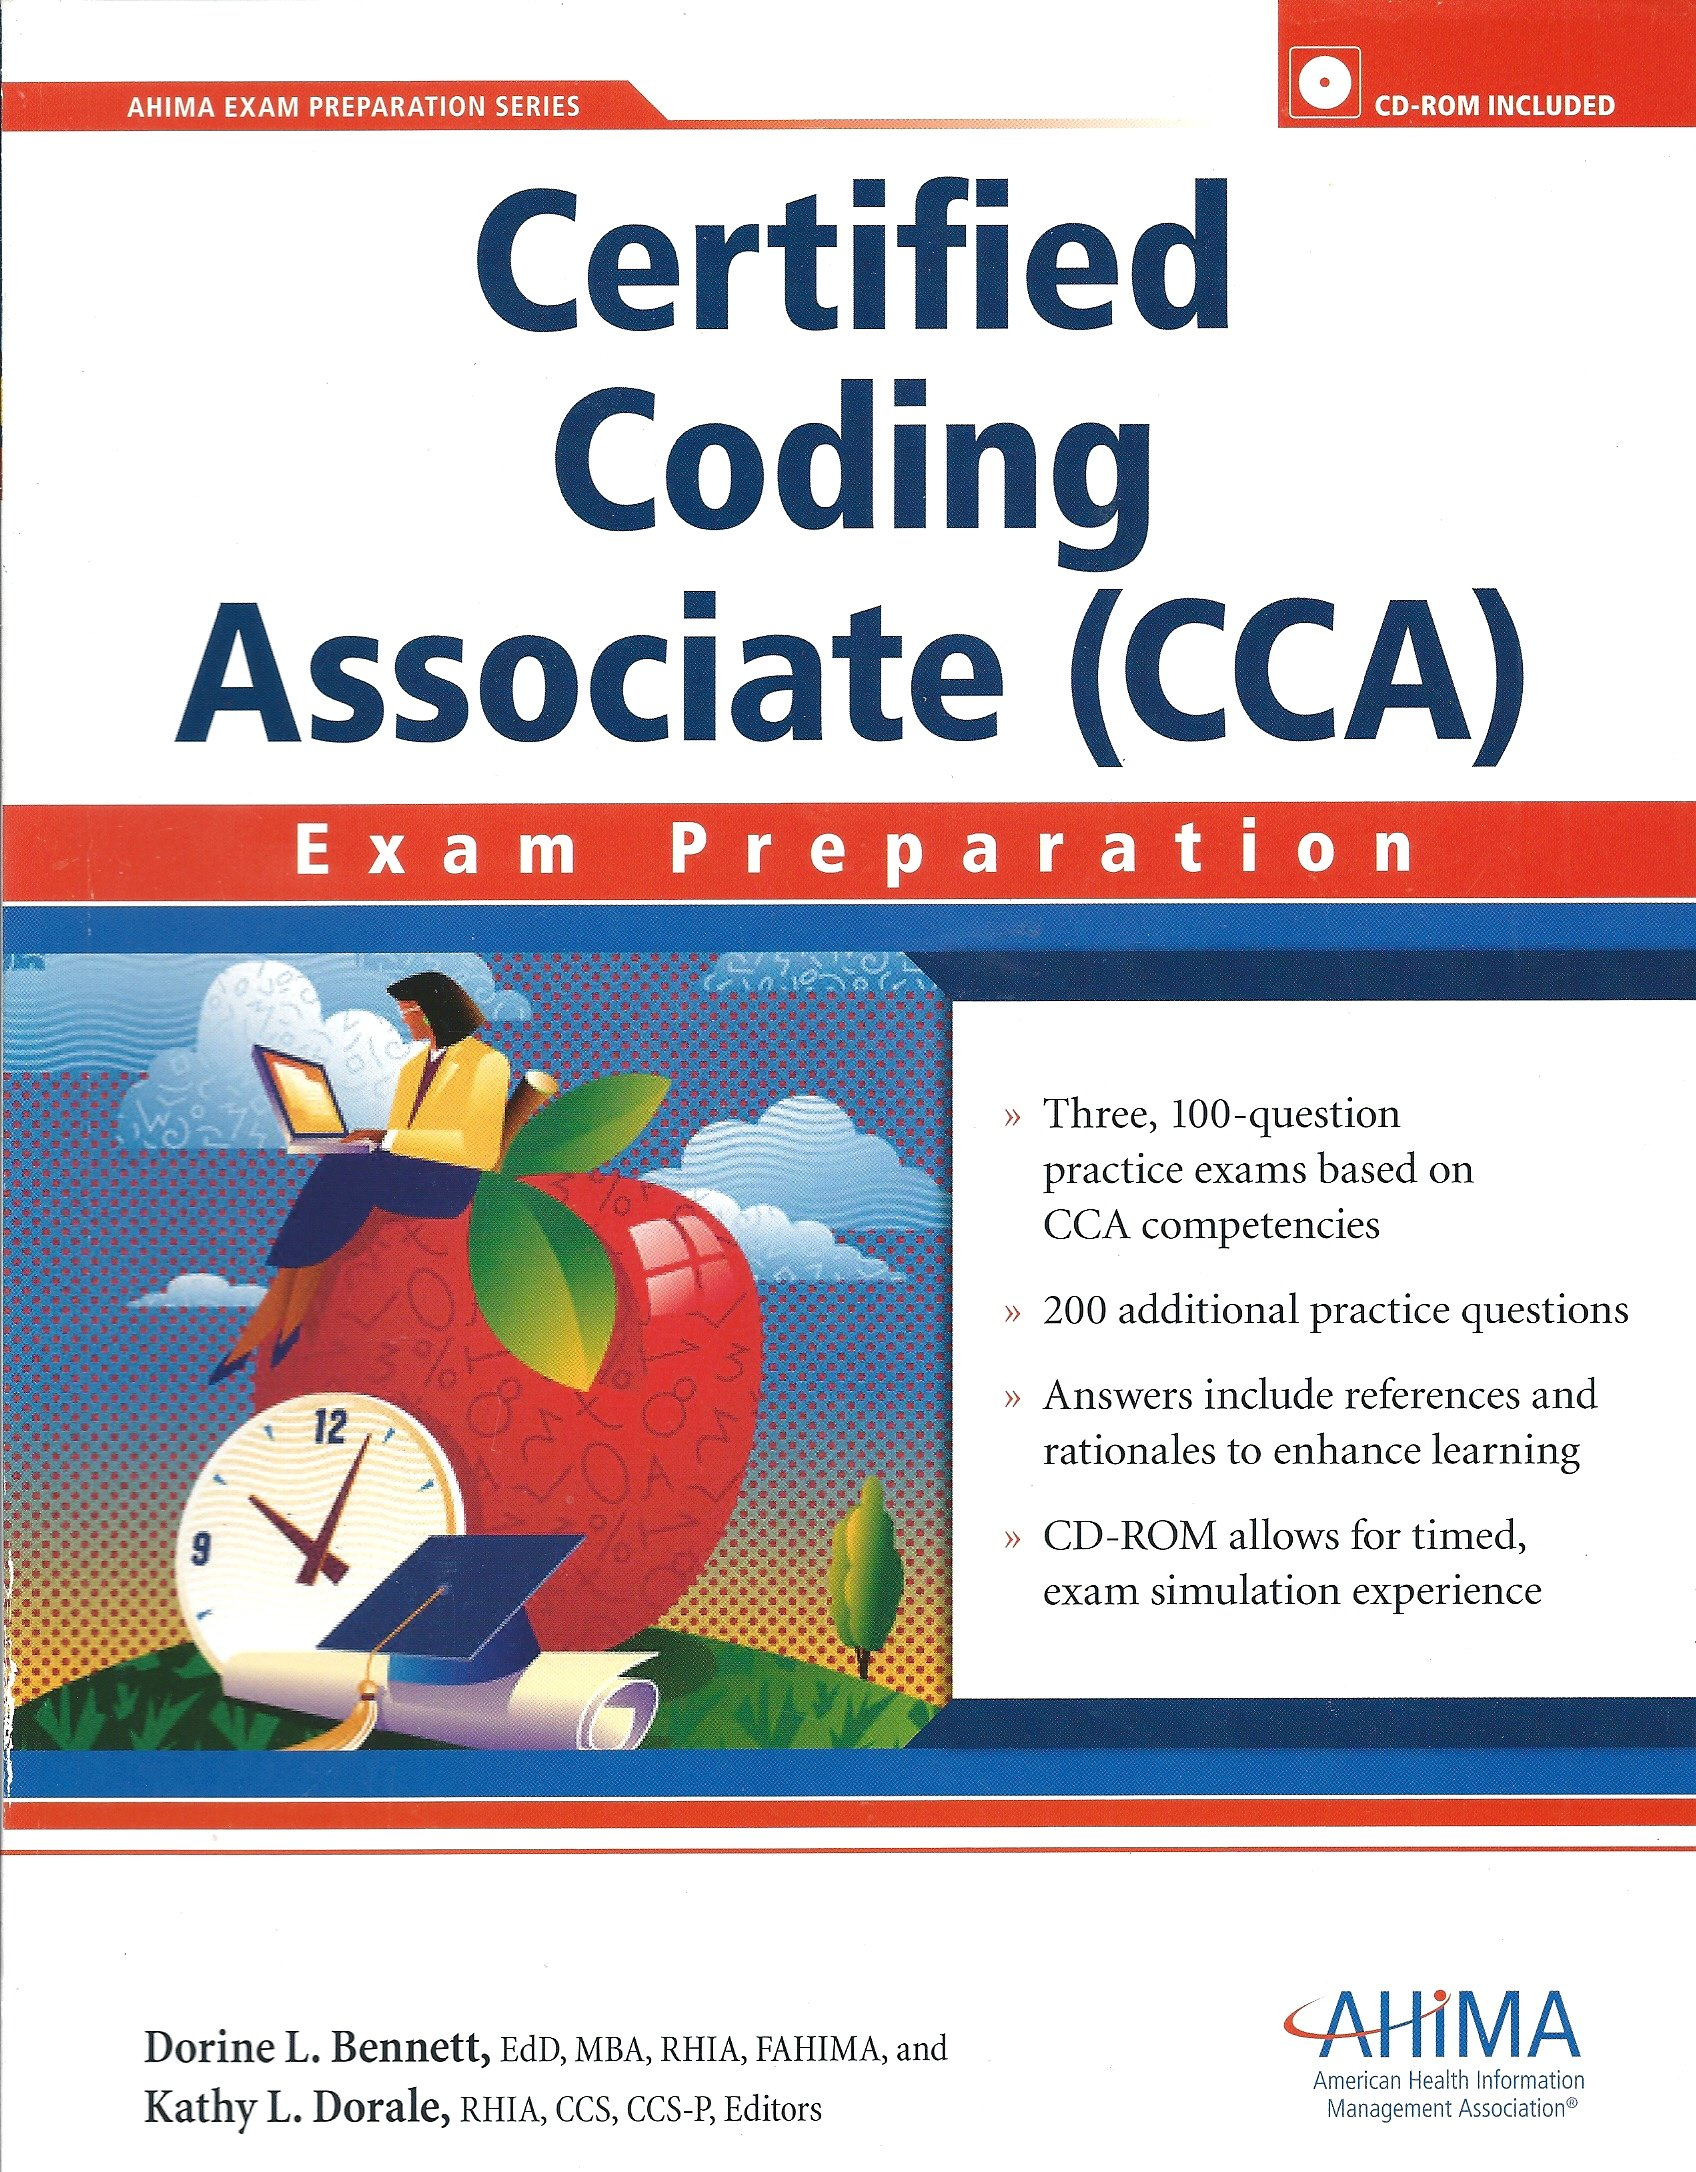 Buy Certified Coding Associate Cca Exam Preparation With Cdrom